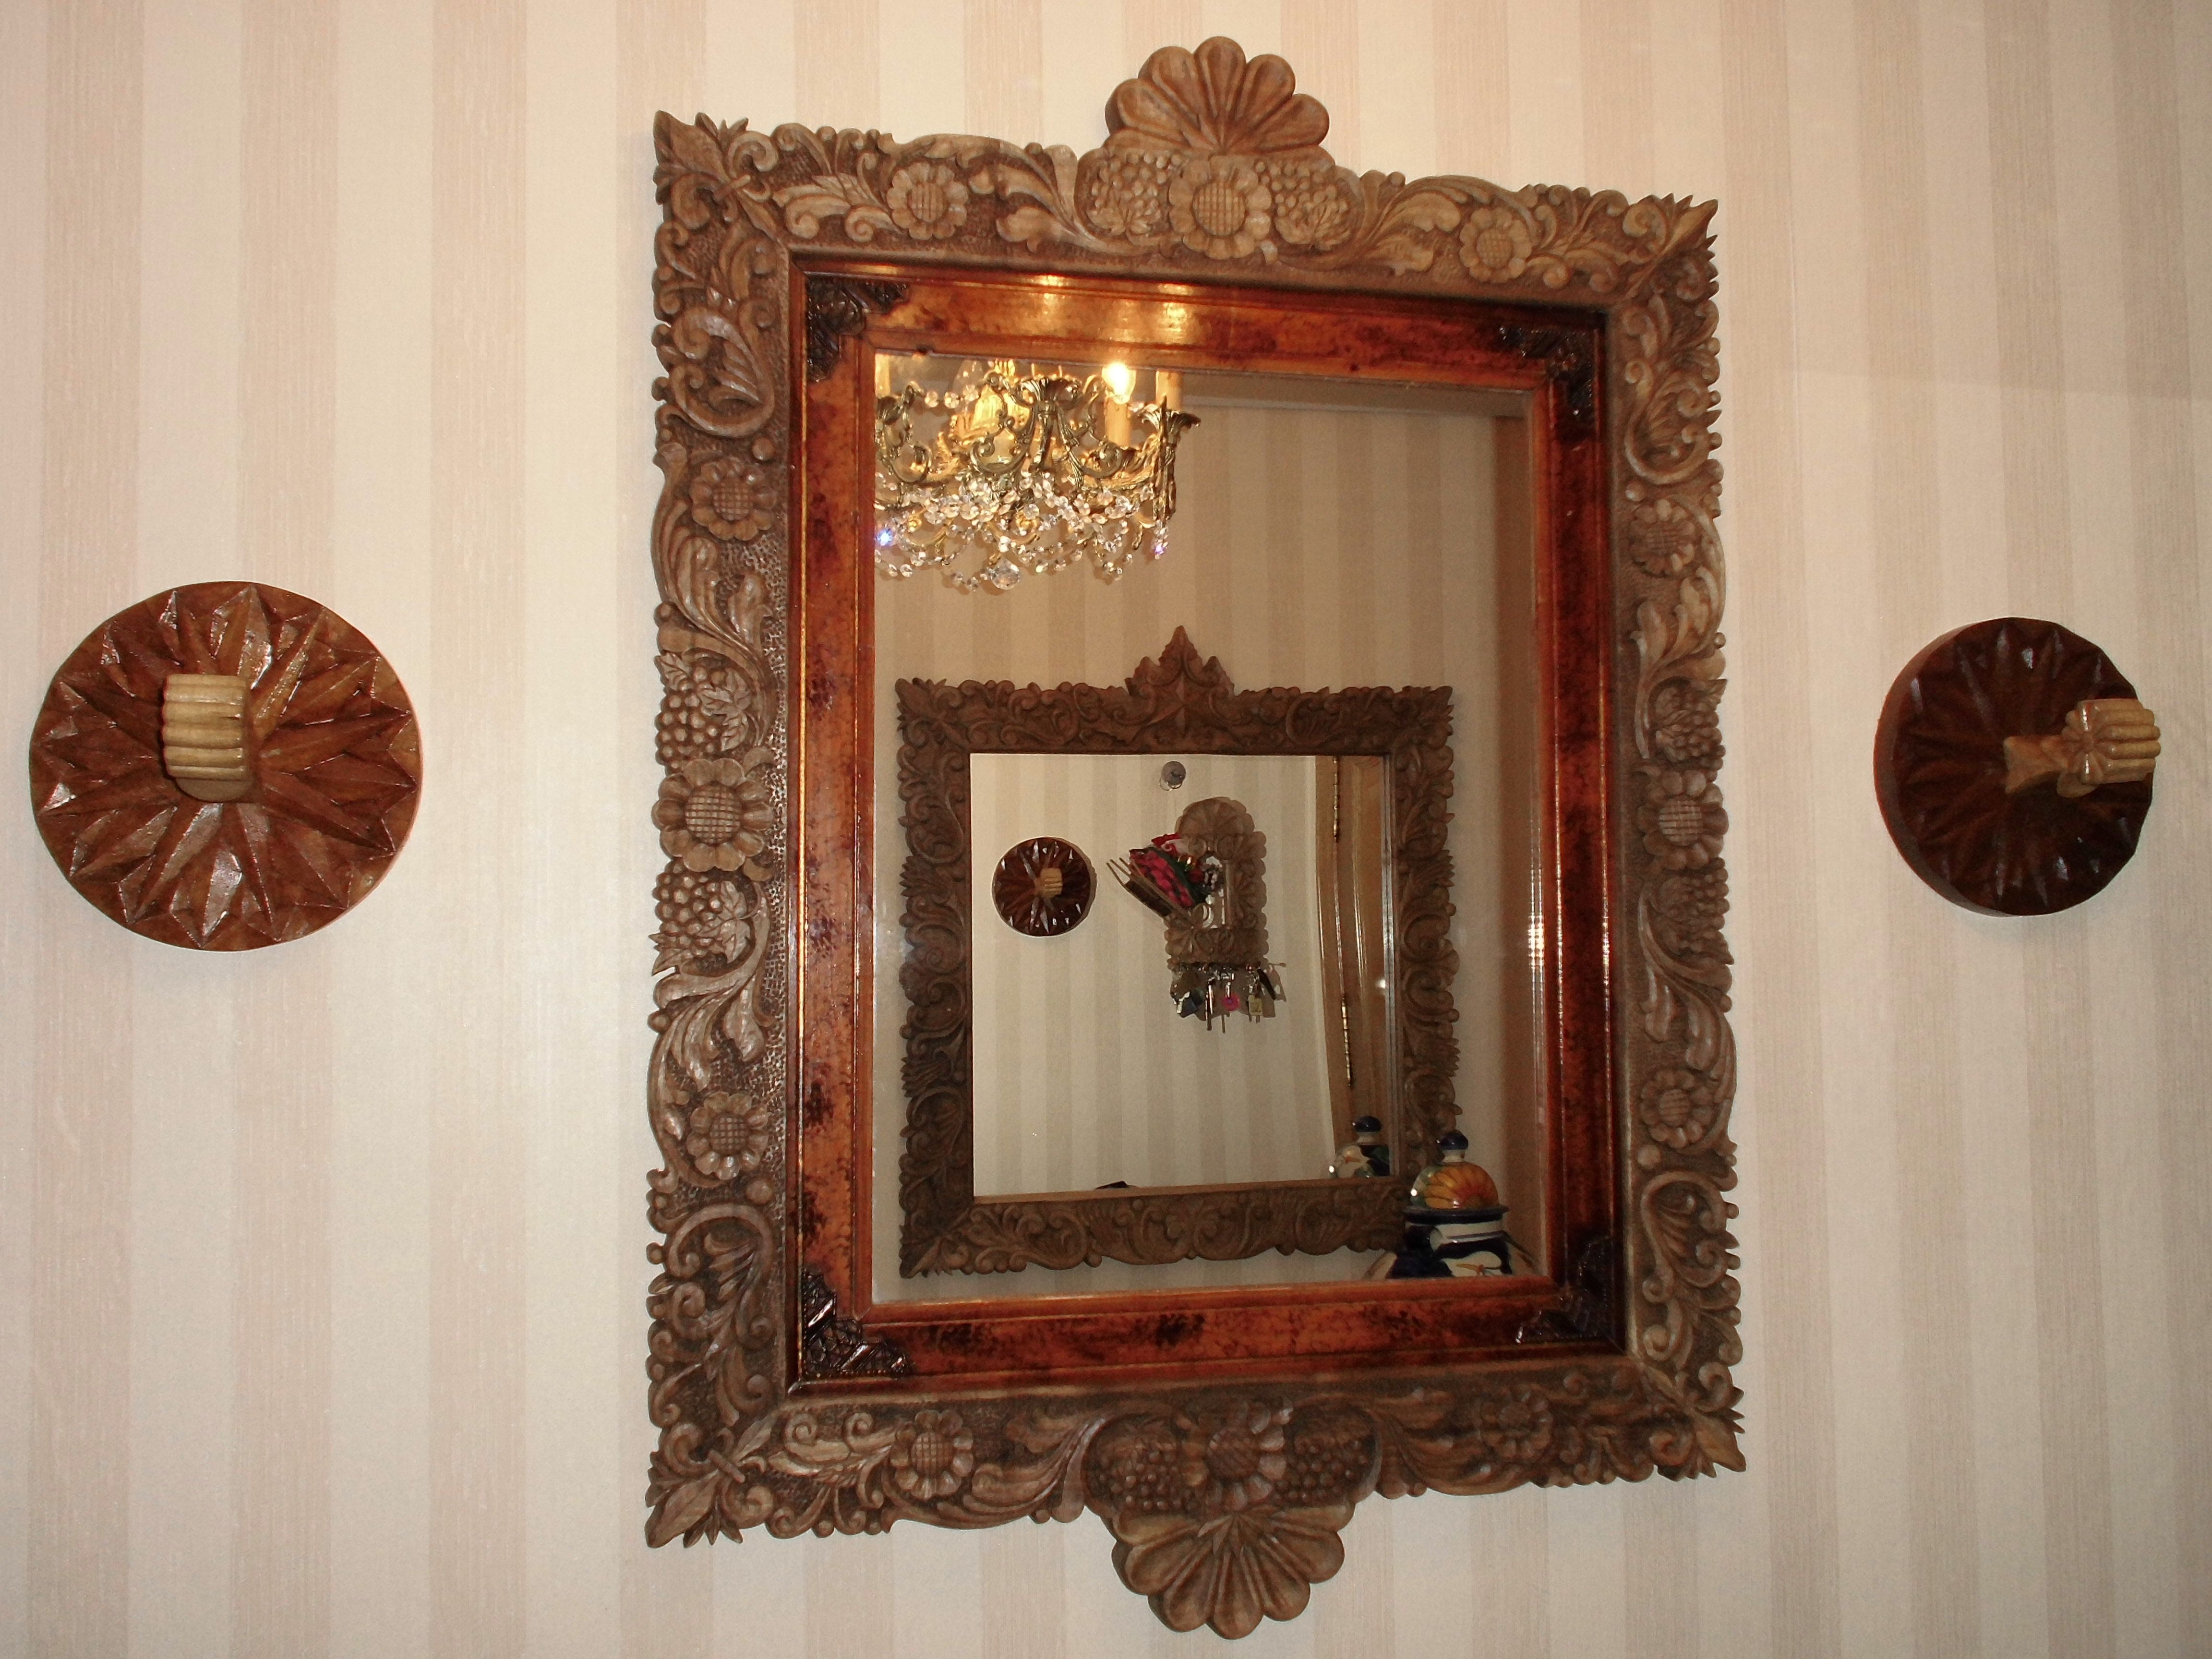 Espejo con #Marco #TalladoenMadera #mirror #woodcarving #frame ...